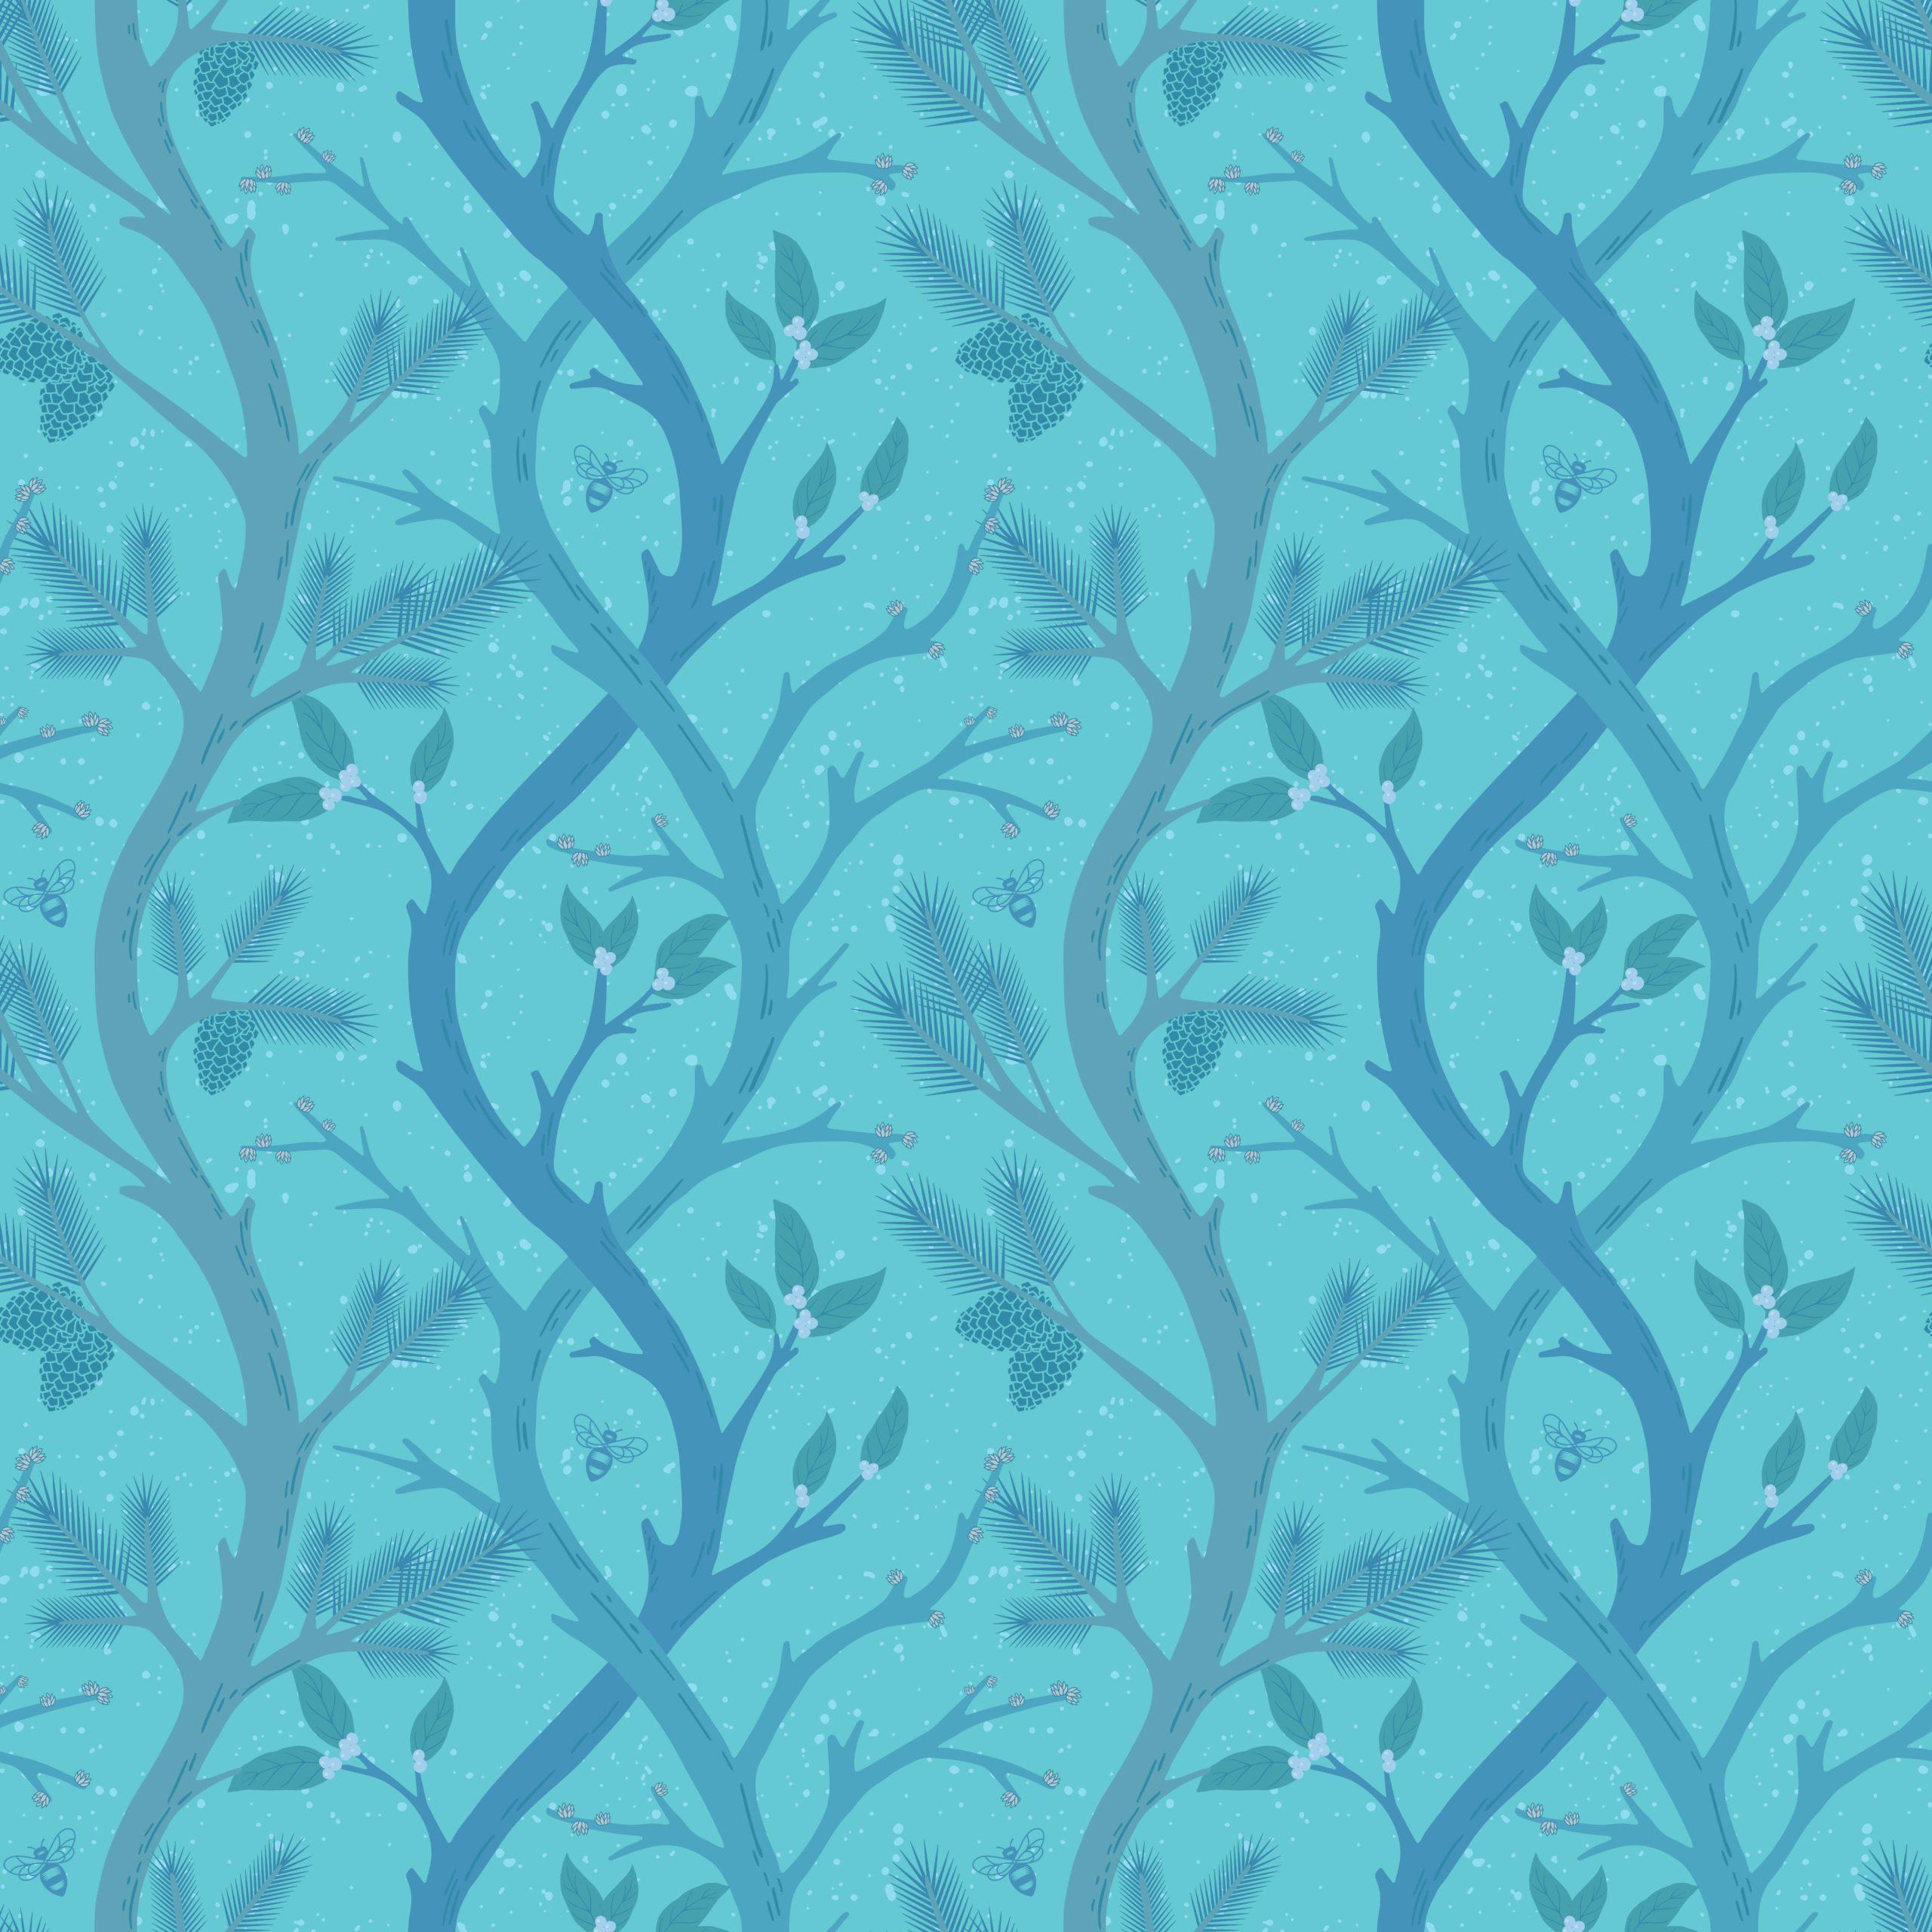 ColdWallpaper#8_Design_Jaclyn_02